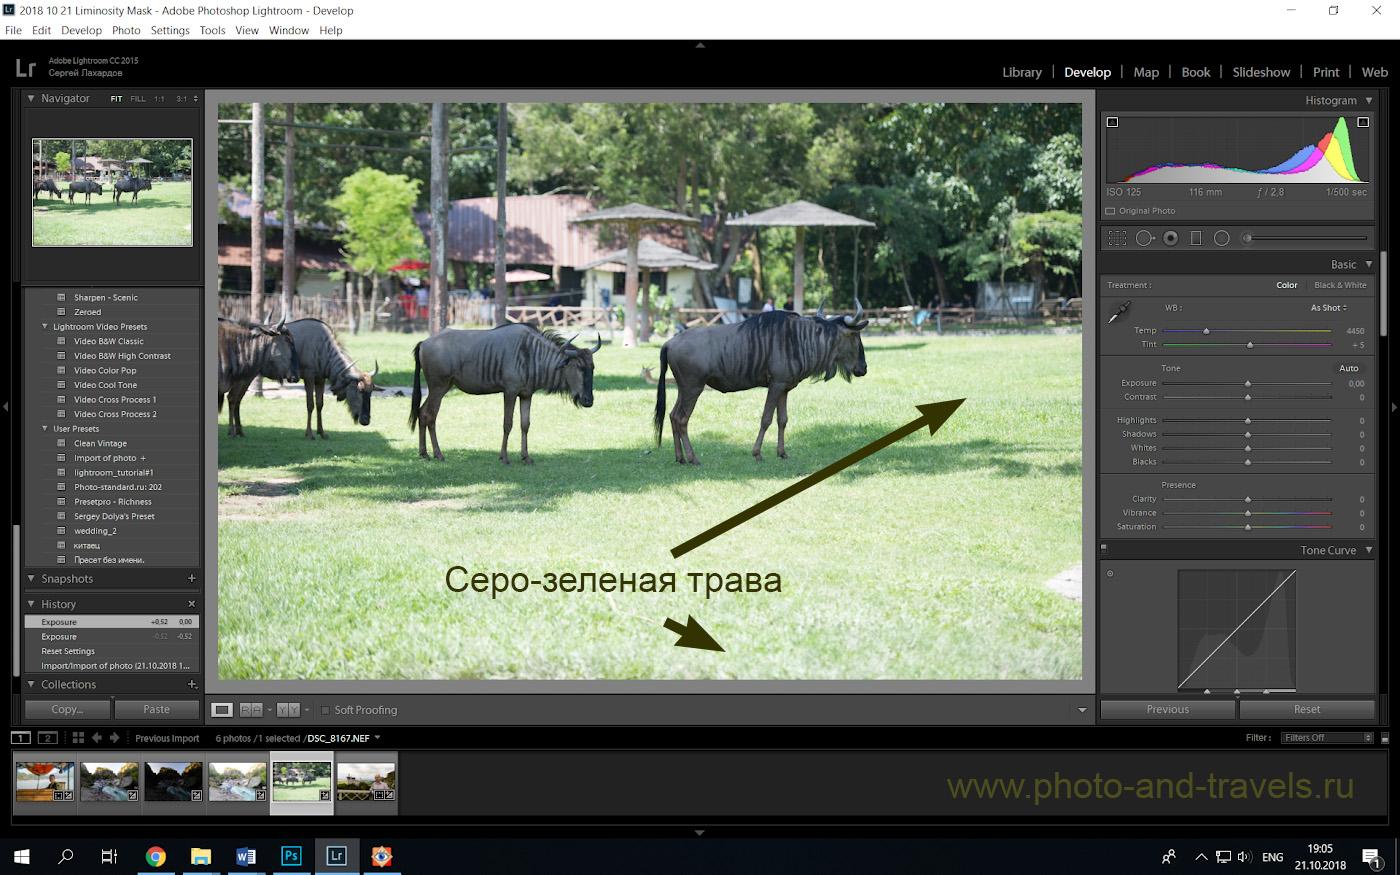 Фото 21. Необработанный RAW с камеры Nikon D610. Съемка велась телеобъективом Nikon 70-200mm f/2.8G. Настройки: 1/500, +0.67, f/2.8, ISO 125, ФР=116 мм.